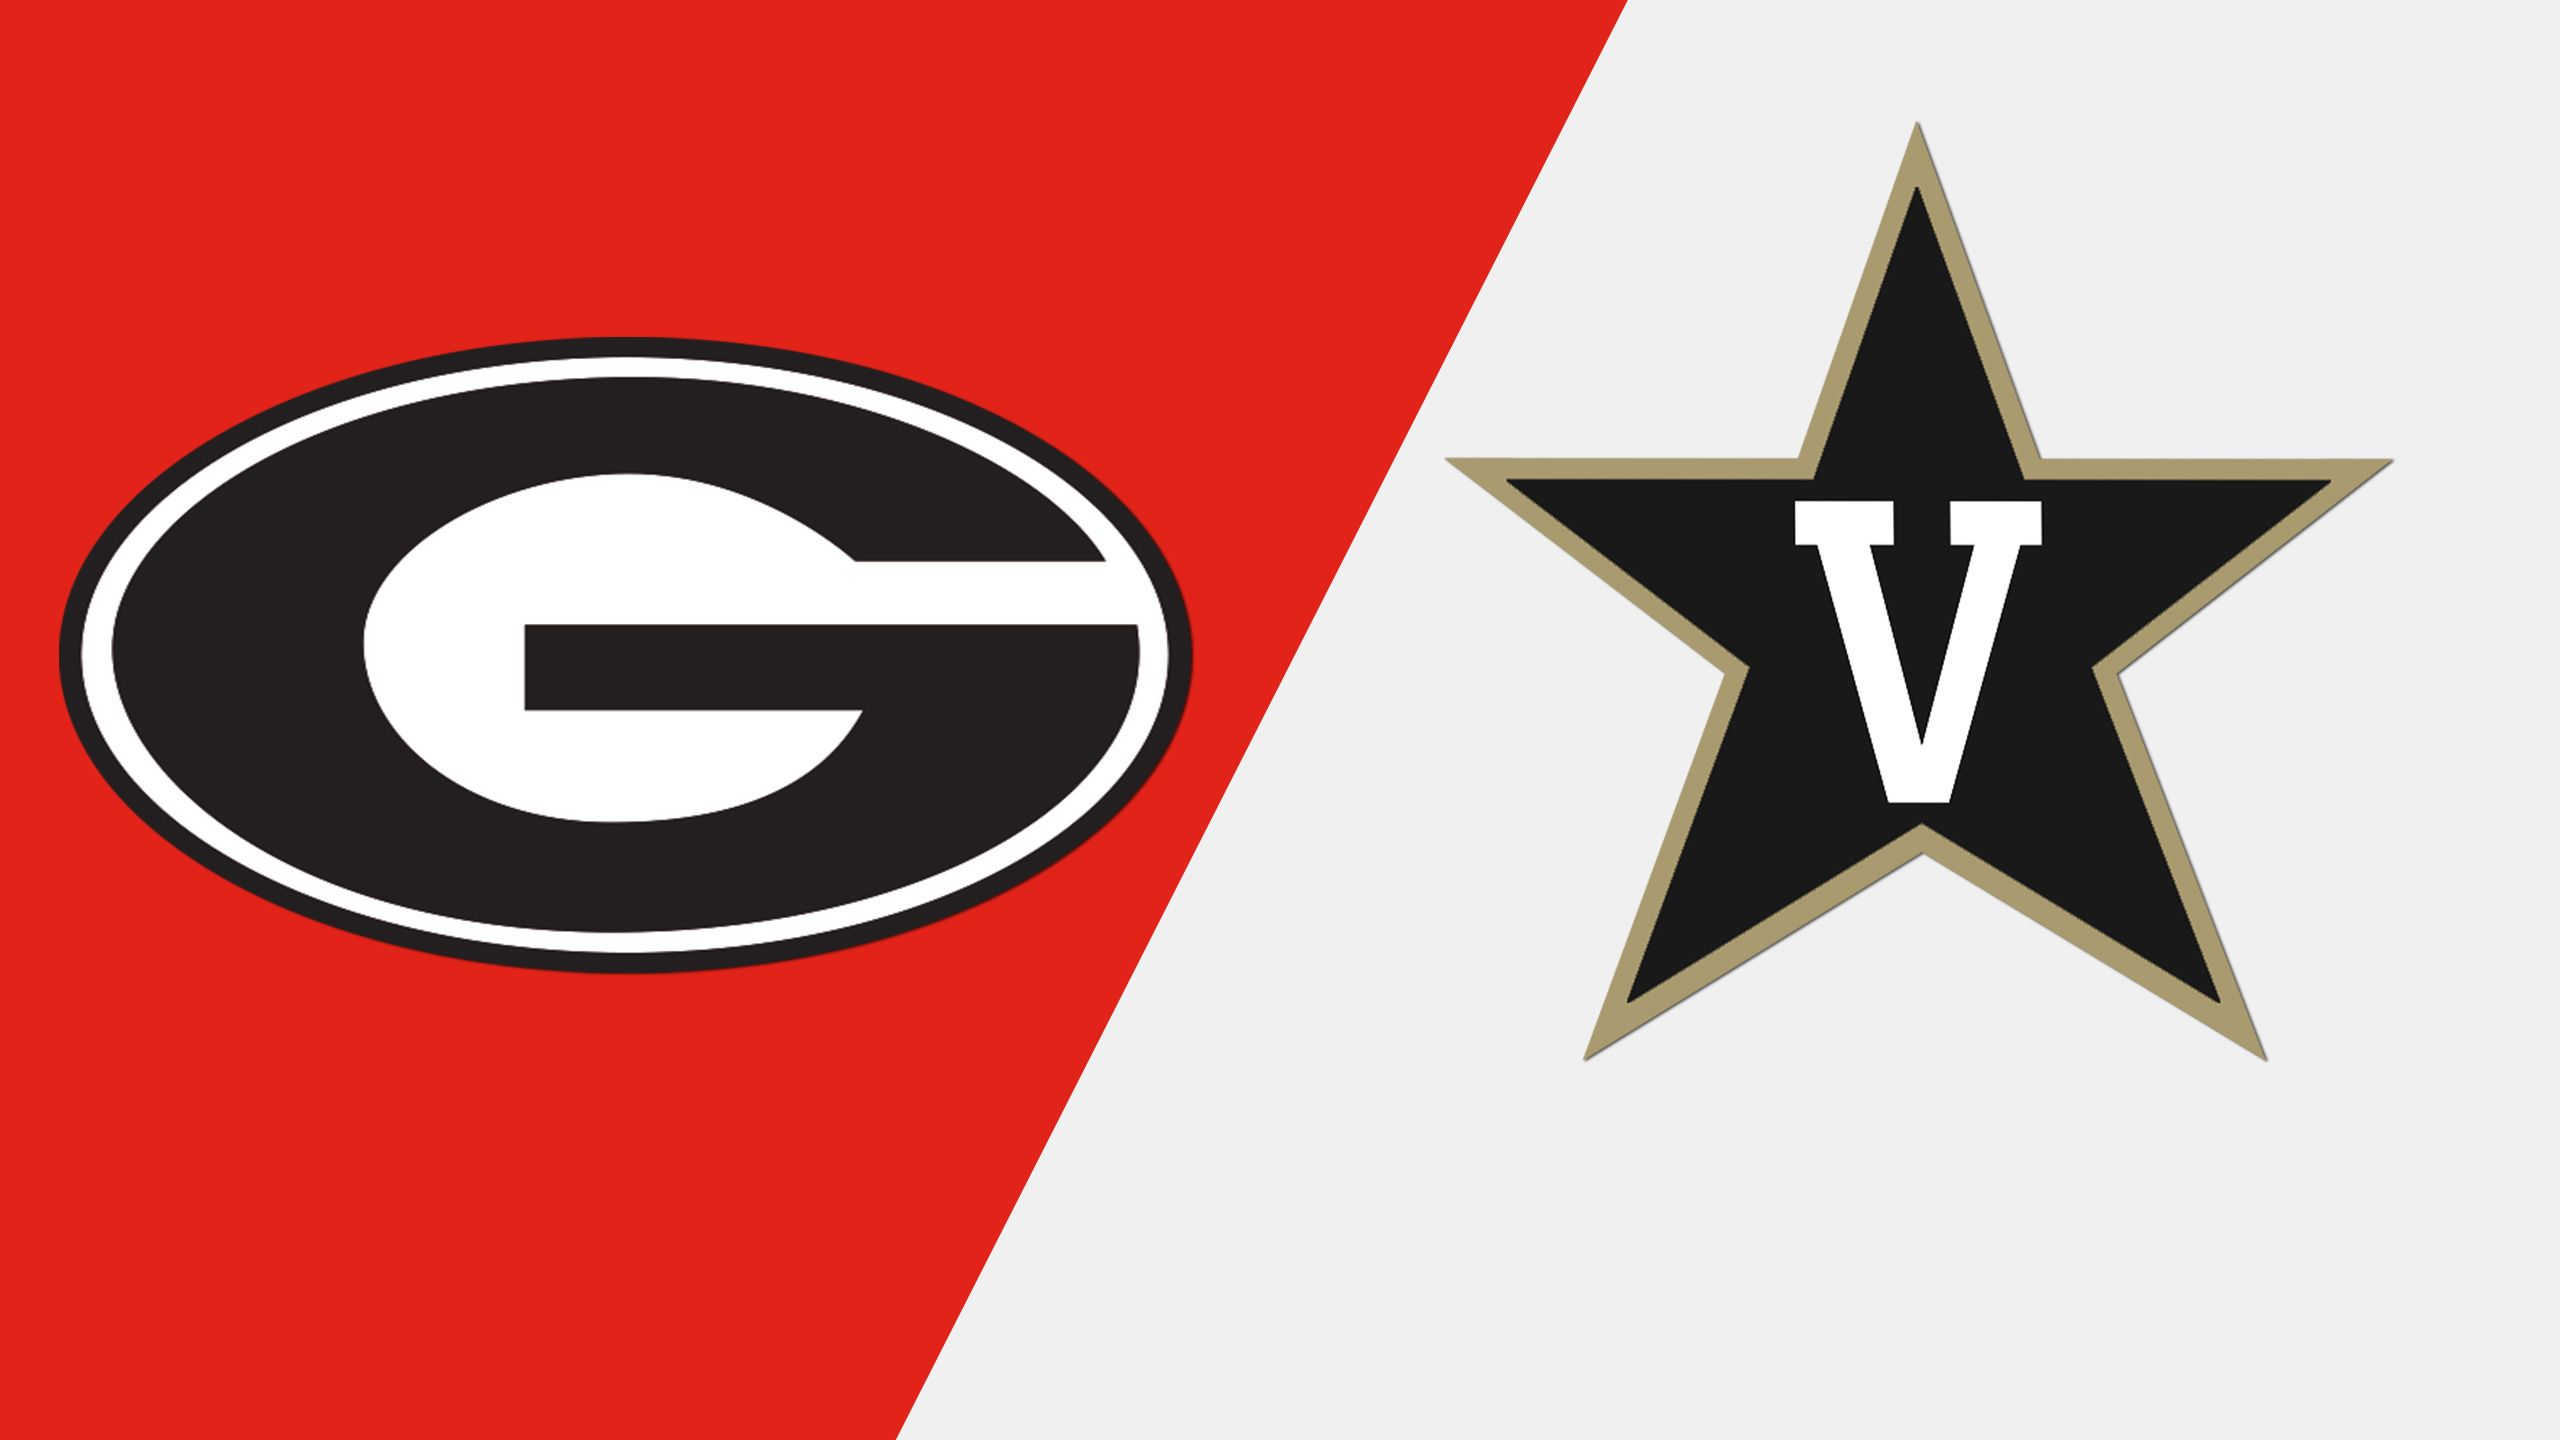 #17 Georgia vs. #16 Vanderbilt (Baseball)